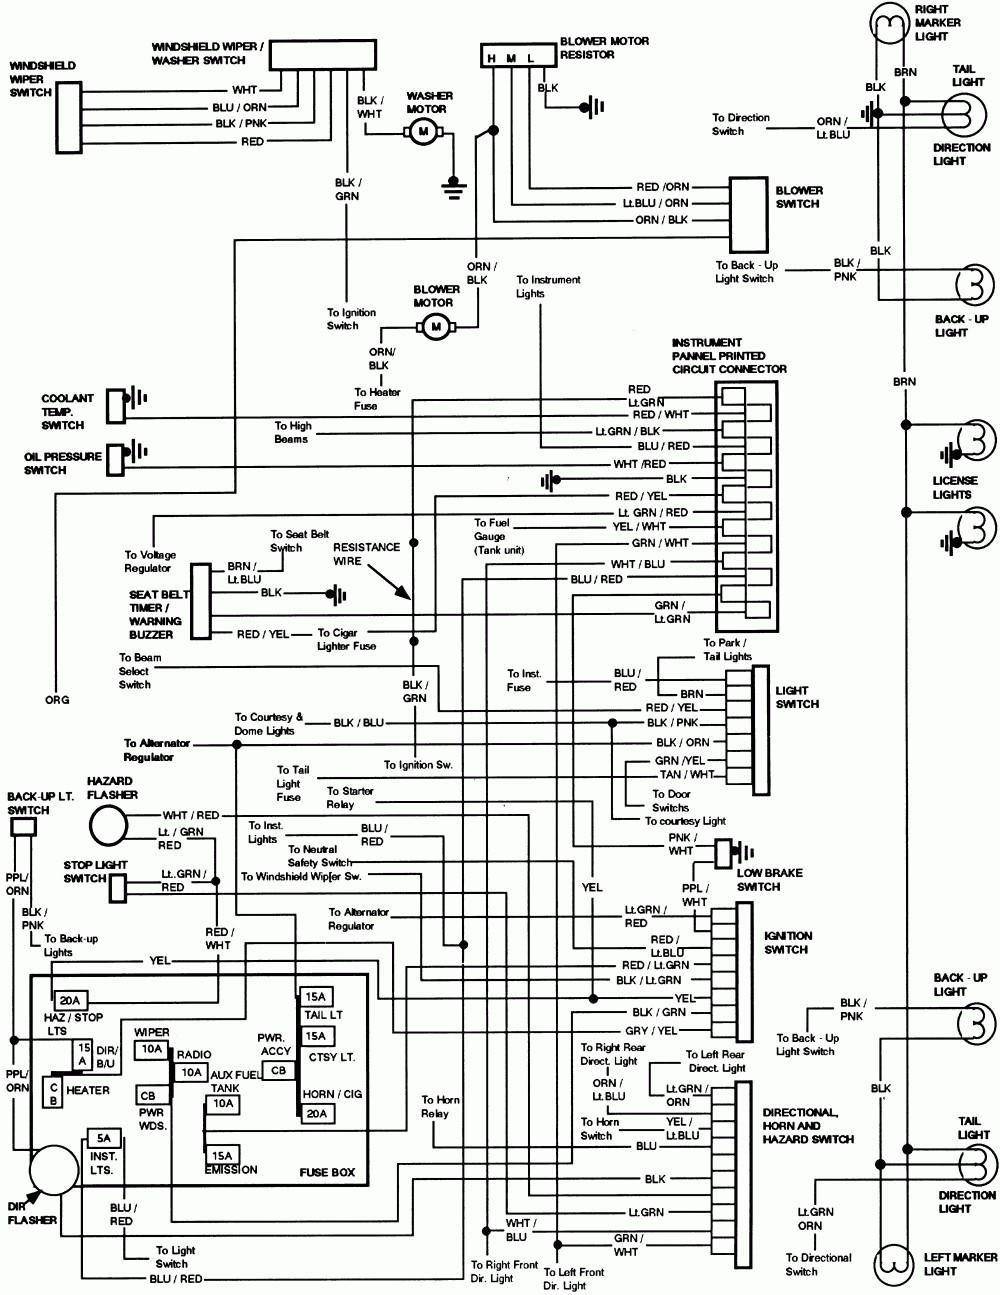 1999 ford 7.3 fuse diagram